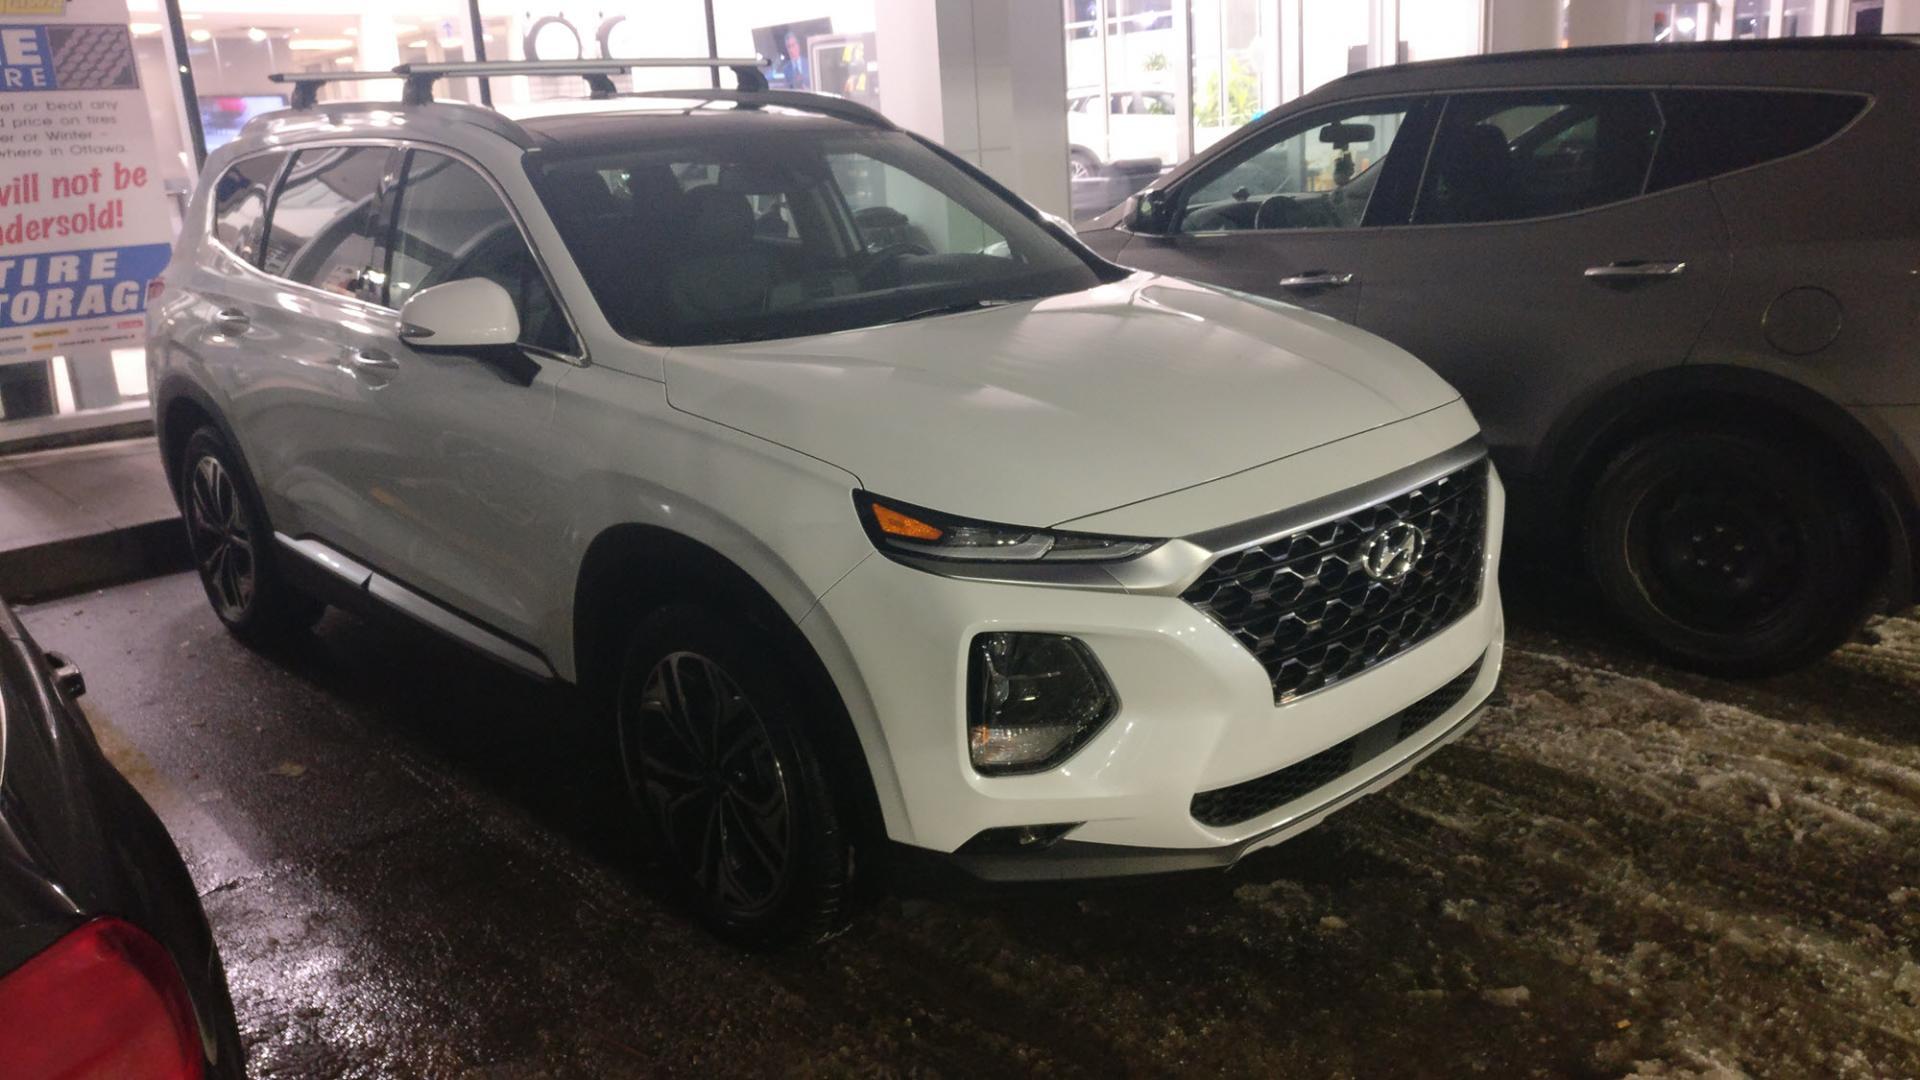 8c8192826740 Crossbars (roof rack) for 2019 Santa Fe Ultimate?   Hyundai Forums